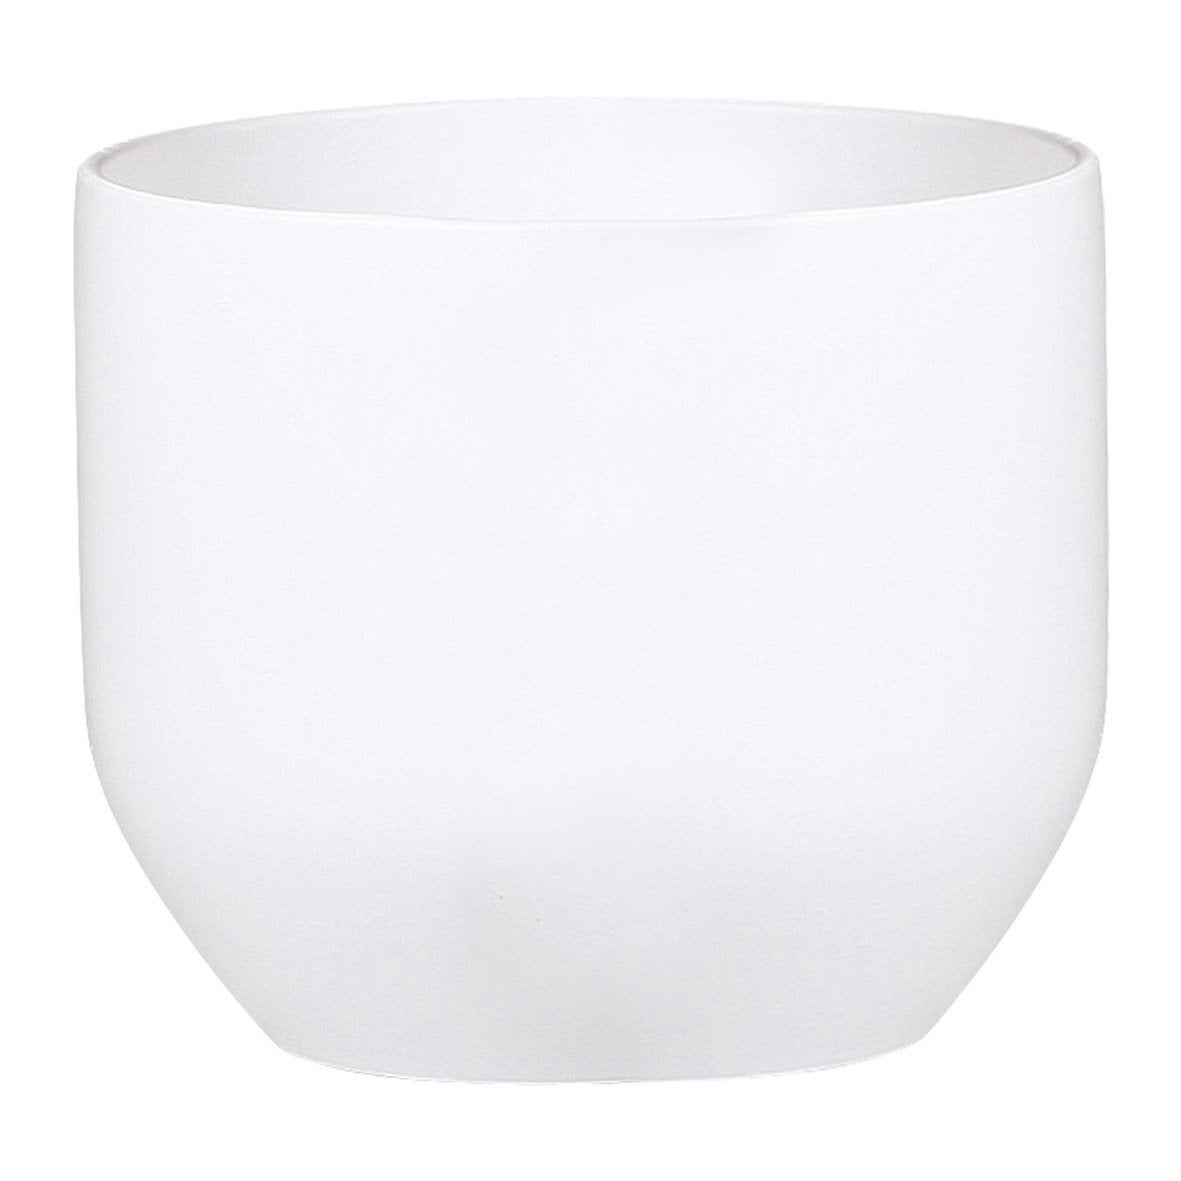 cache pot terre cuite maill e scheurich x cm blanc leroy merlin. Black Bedroom Furniture Sets. Home Design Ideas